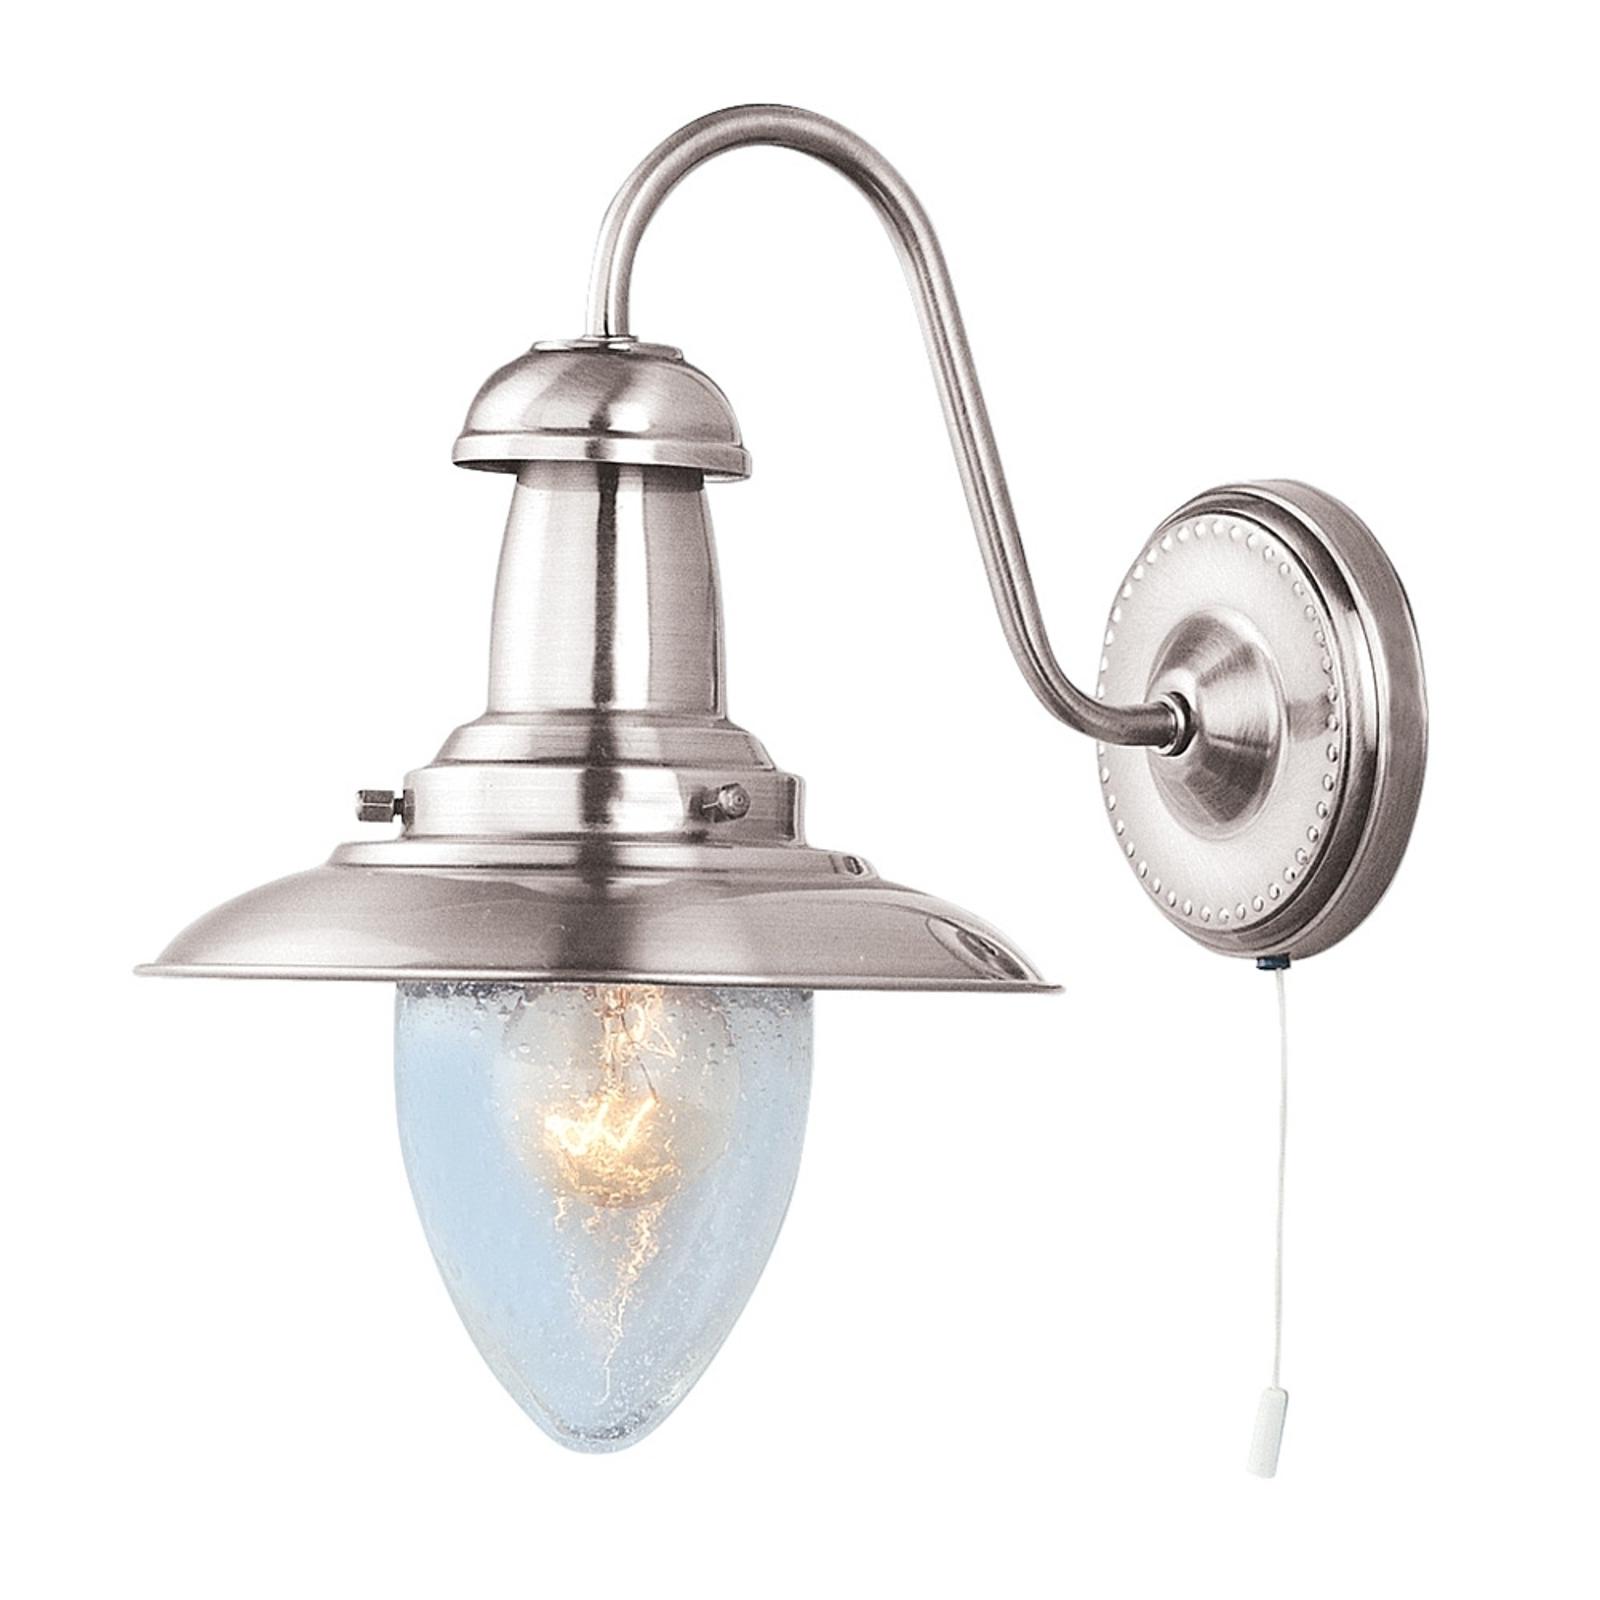 Vegglampe Fisherman i sølv